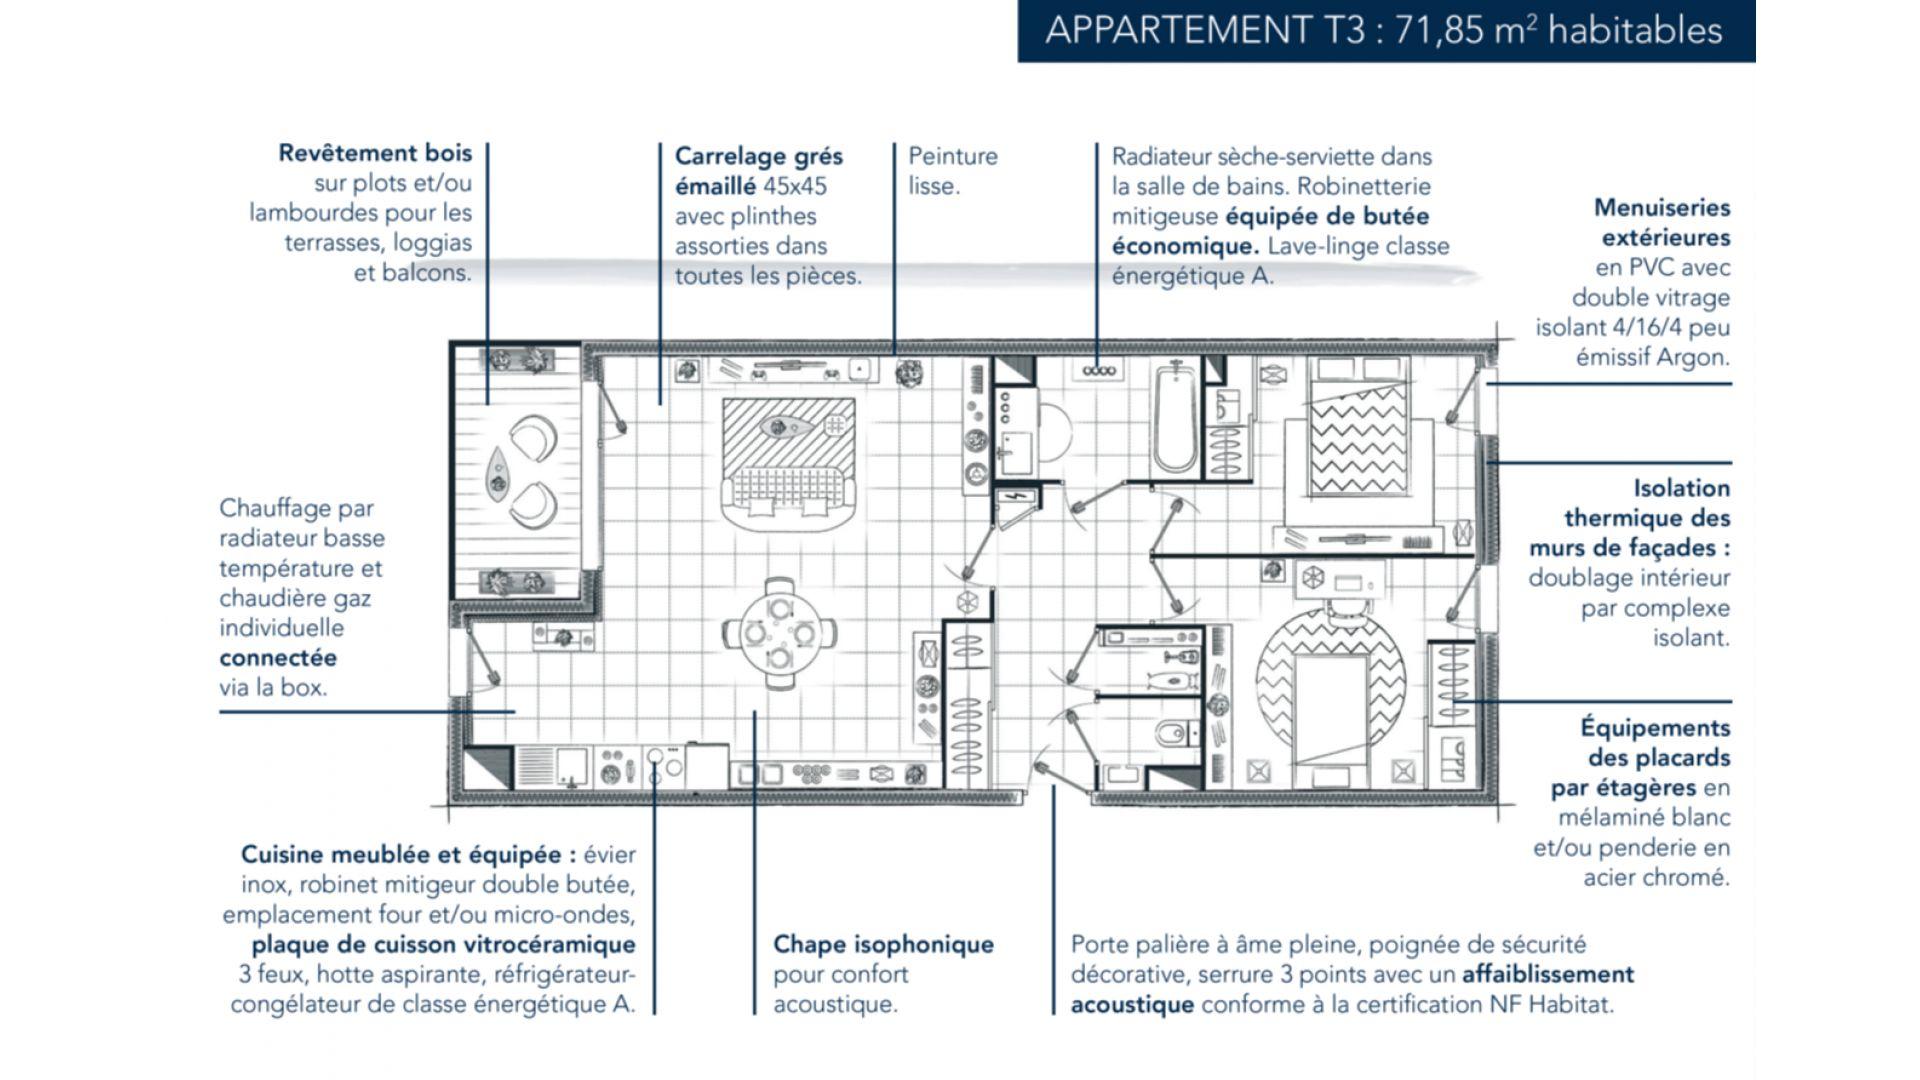 Greencity Immobilier - Clos Charvin - achat appartement neuf du T1 au T3 - Bonneville 74130  - plan appartement neuf T3